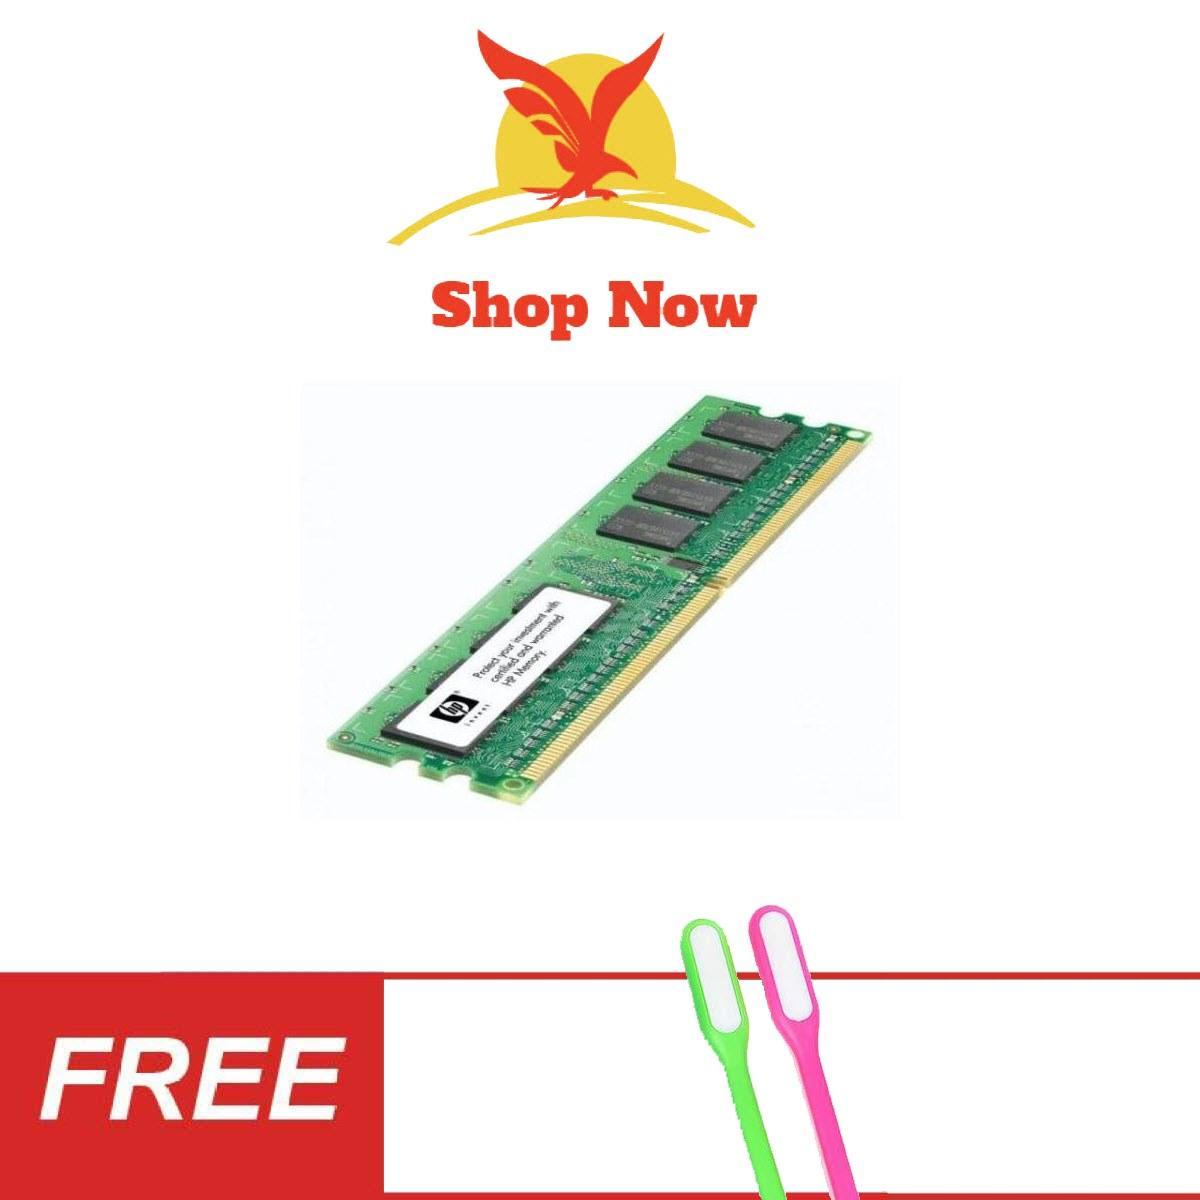 Ram ECC Máy Trạm HP 2GB, DDR 3, Bus 1333Mhz Siêu Bền